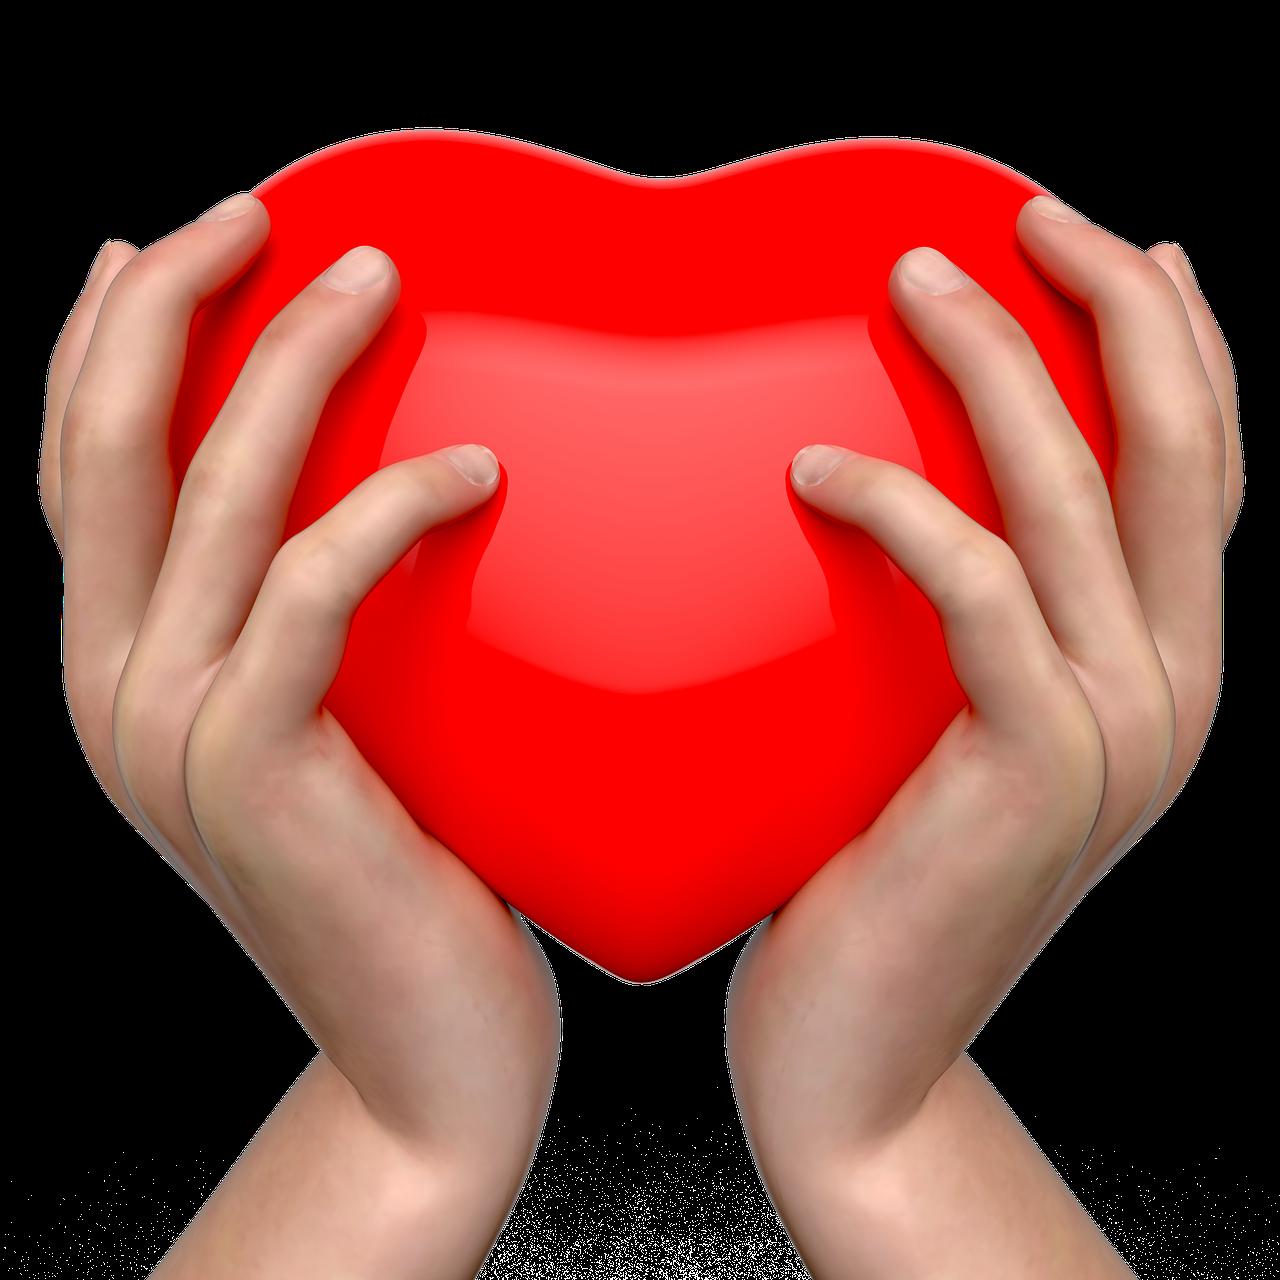 Beautiful Hand Cute Free Image On Pixabay